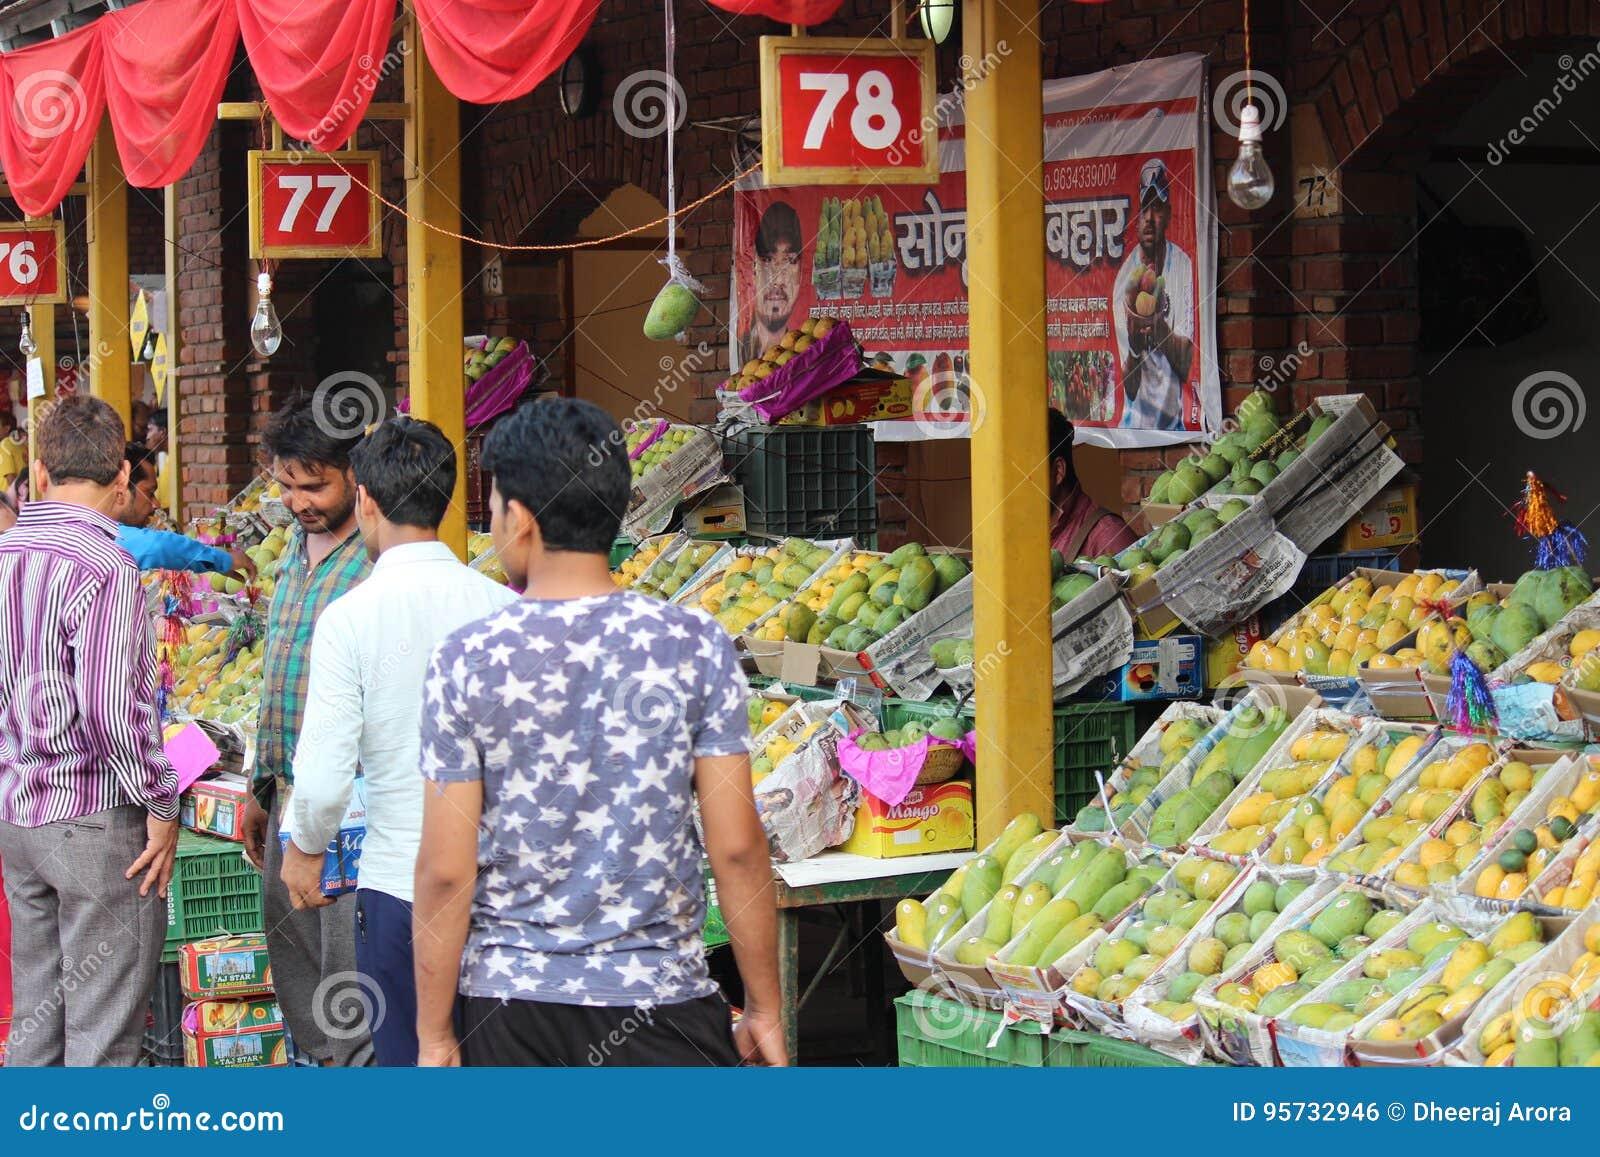 Mangoes For Sale At Mango And Sharbat Fair Editorial Photo